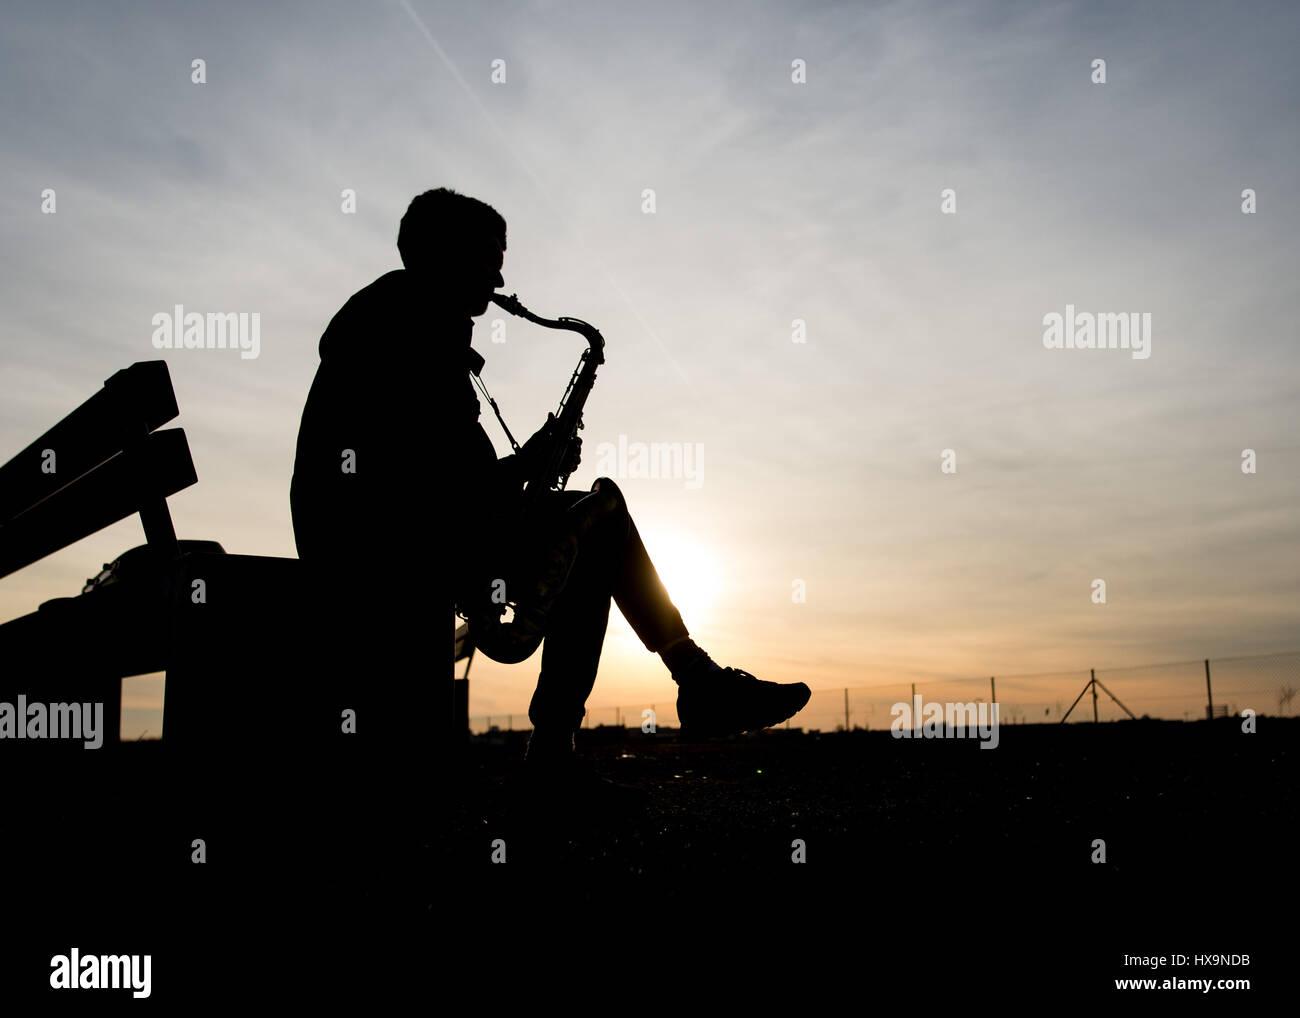 Berlin, Germany. 25th Mar, 2017. A man plays saxophone at sunset at Tempelhofer Feld (lit. Tempelhof Field) in Berlin, - Stock Image